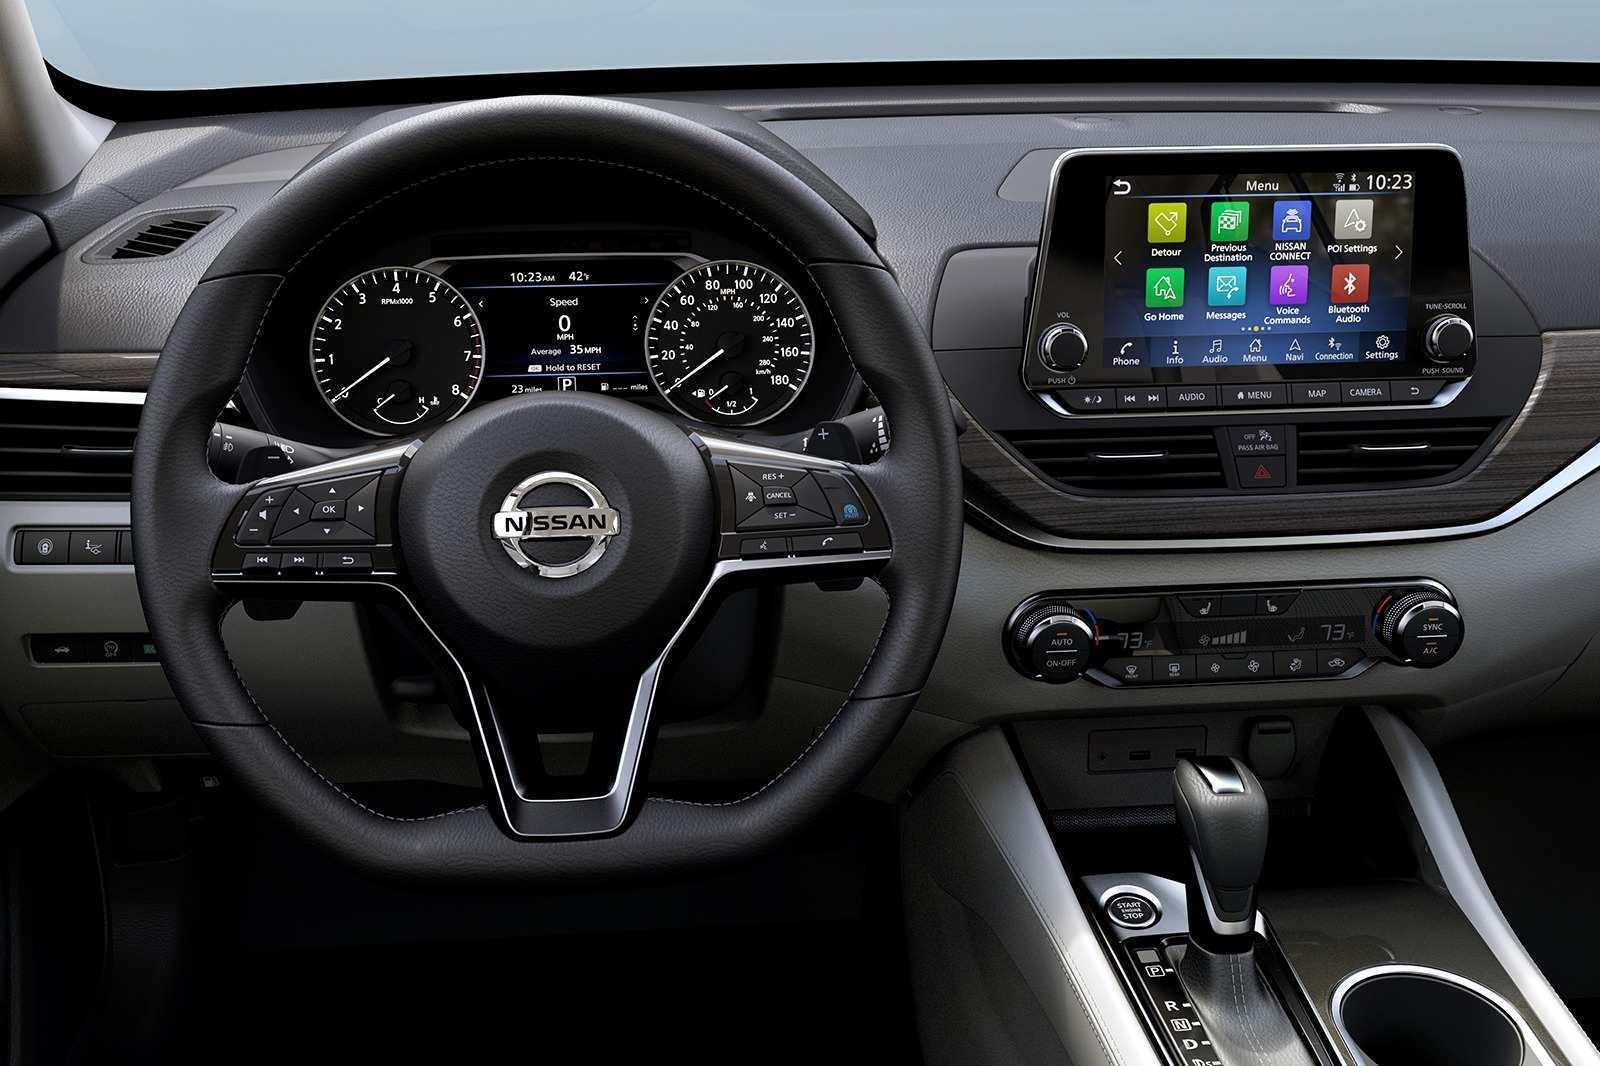 81 Great New Nissan Altima 2019 Price New Interior New Review with New Nissan Altima 2019 Price New Interior